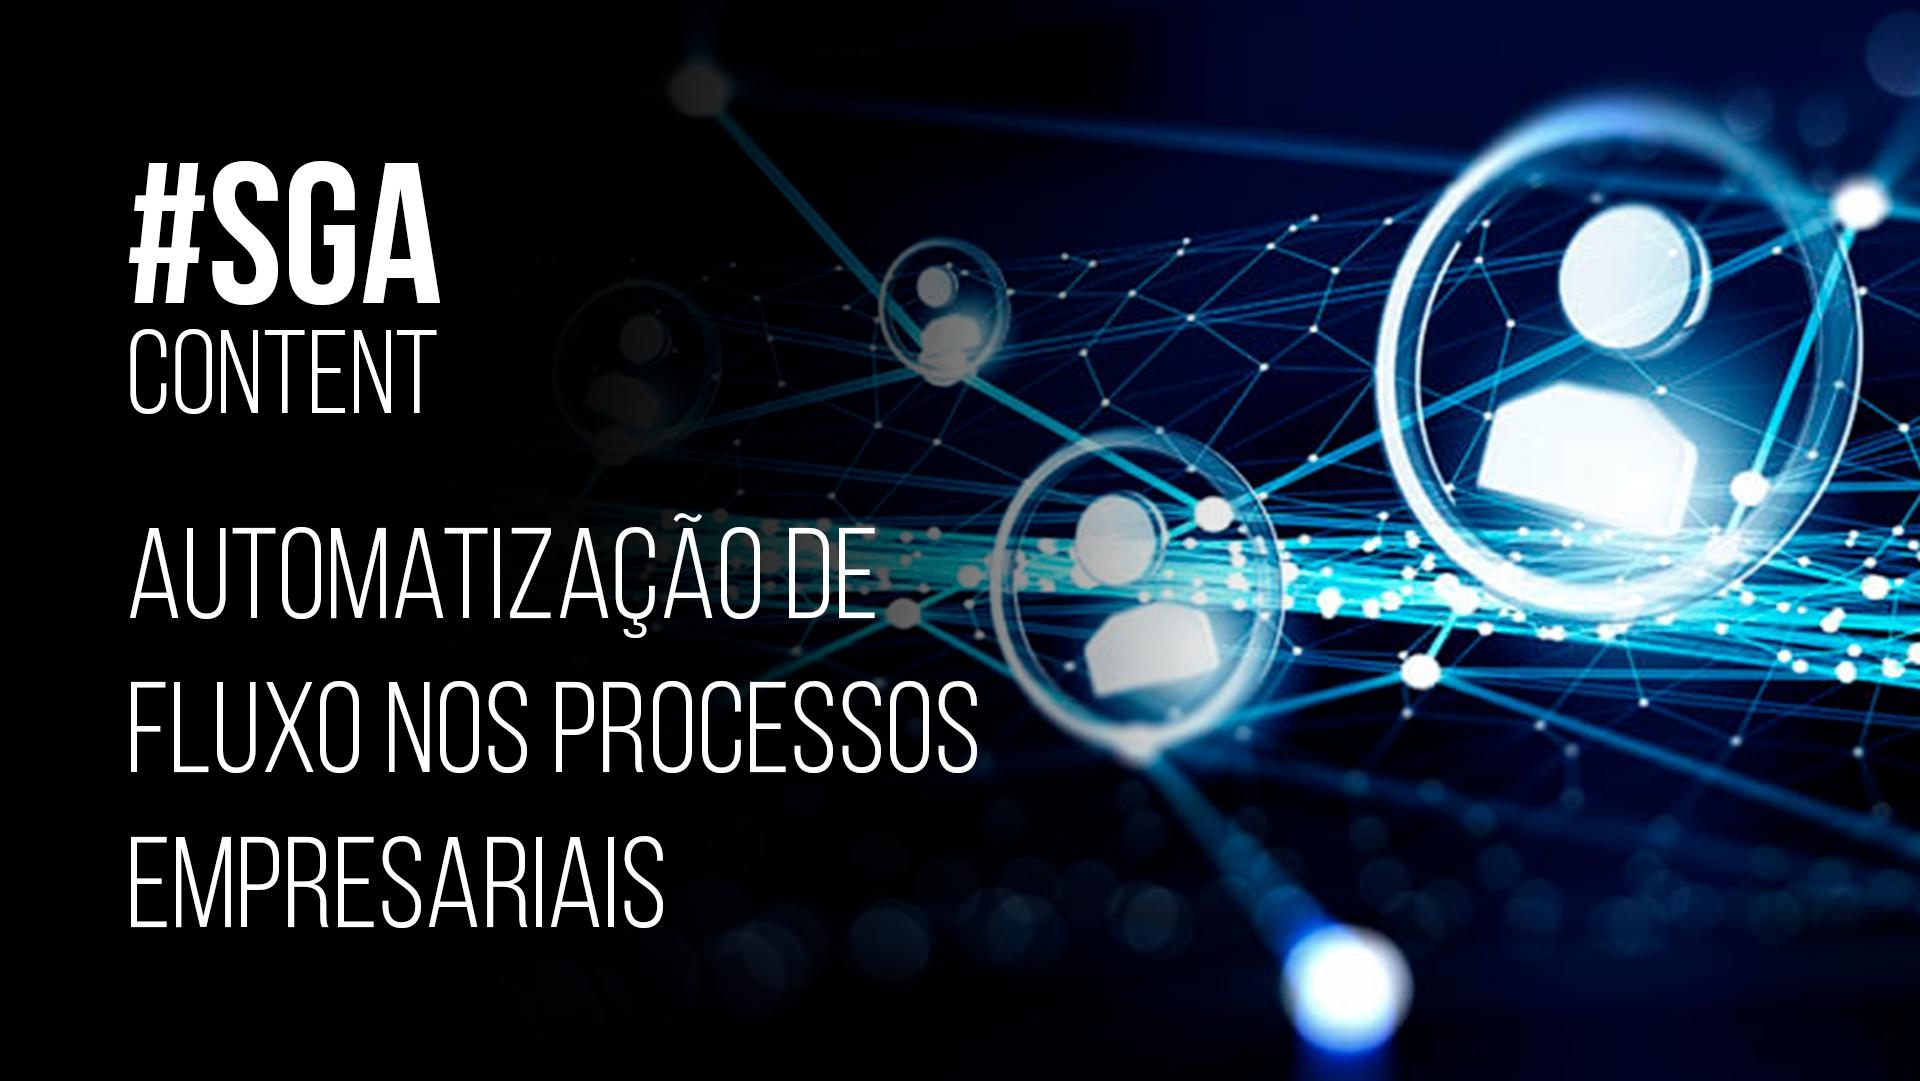 Automatizacao-de-fluxo-nos-processos-empresariais